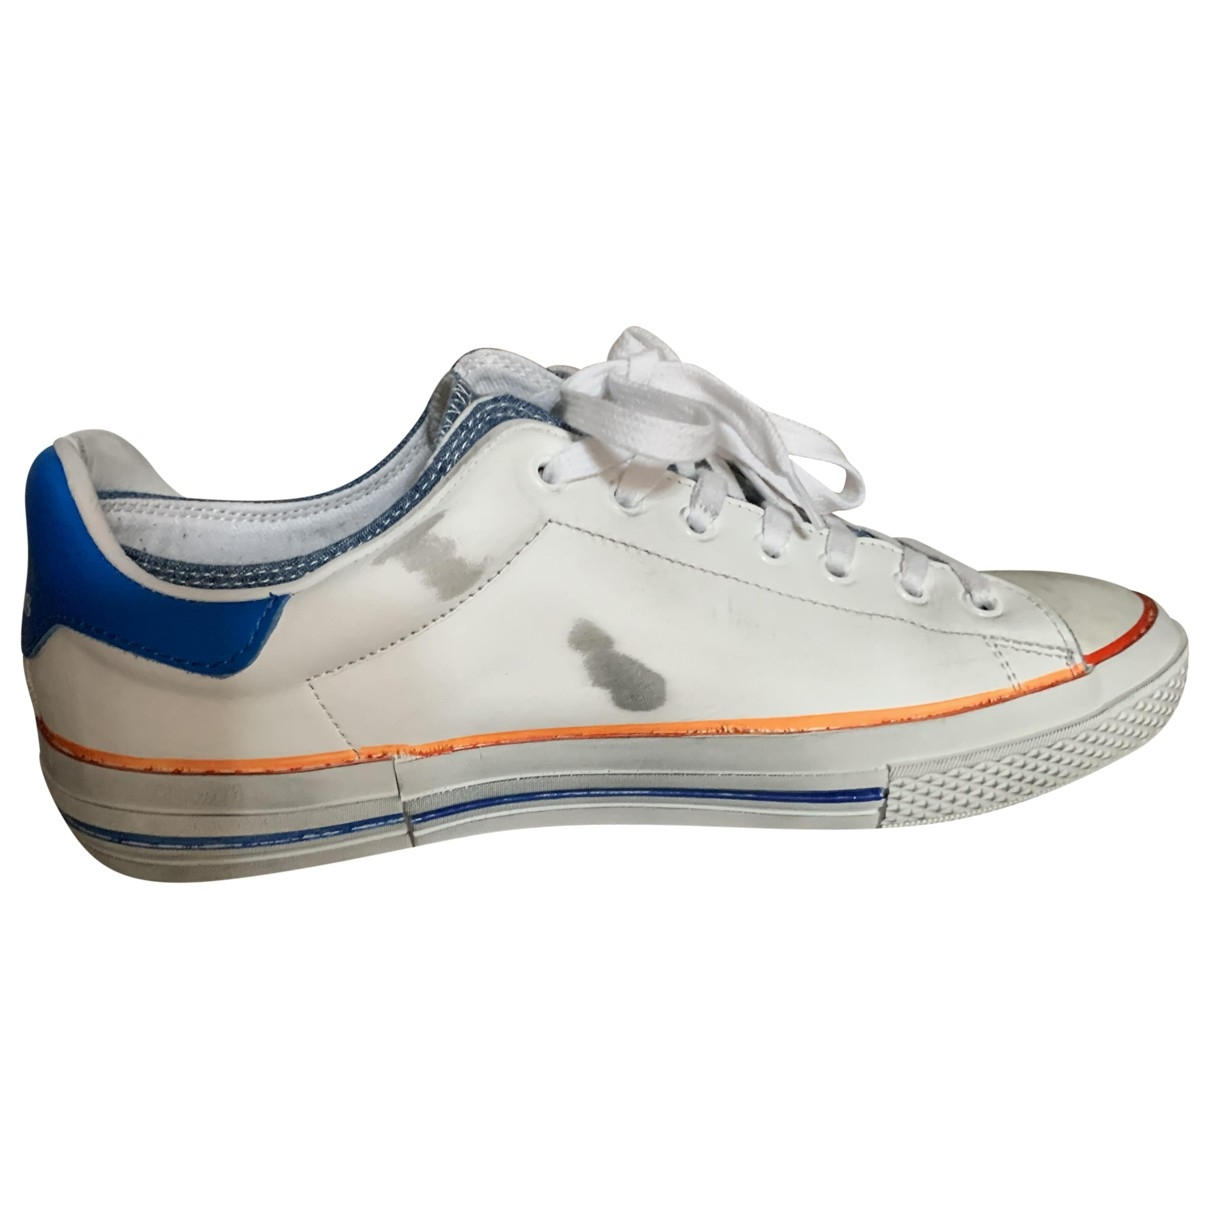 Golden Goose \N Sneakers in  Weiss Leder